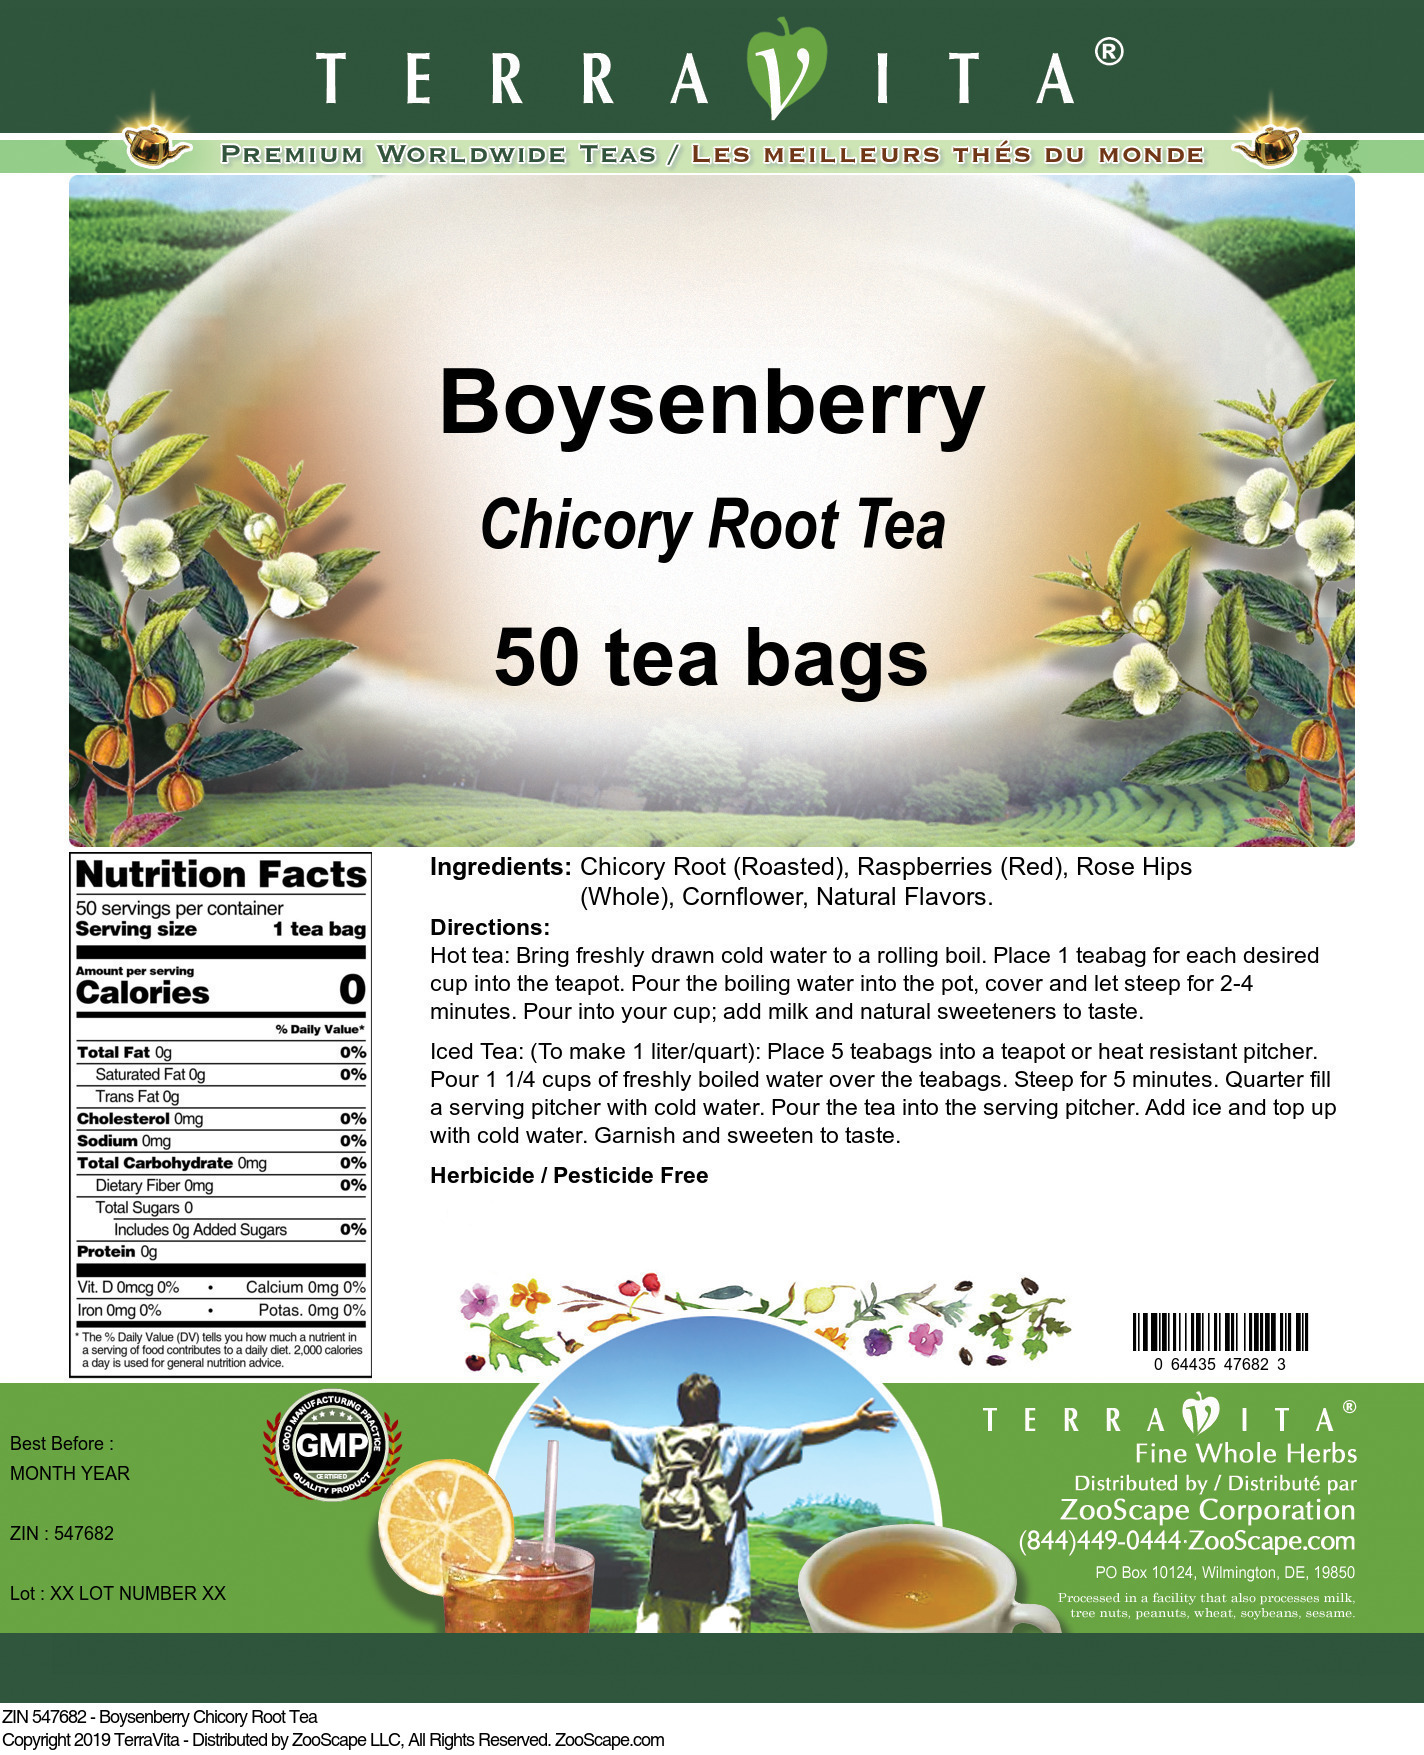 Boysenberry Chicory Root